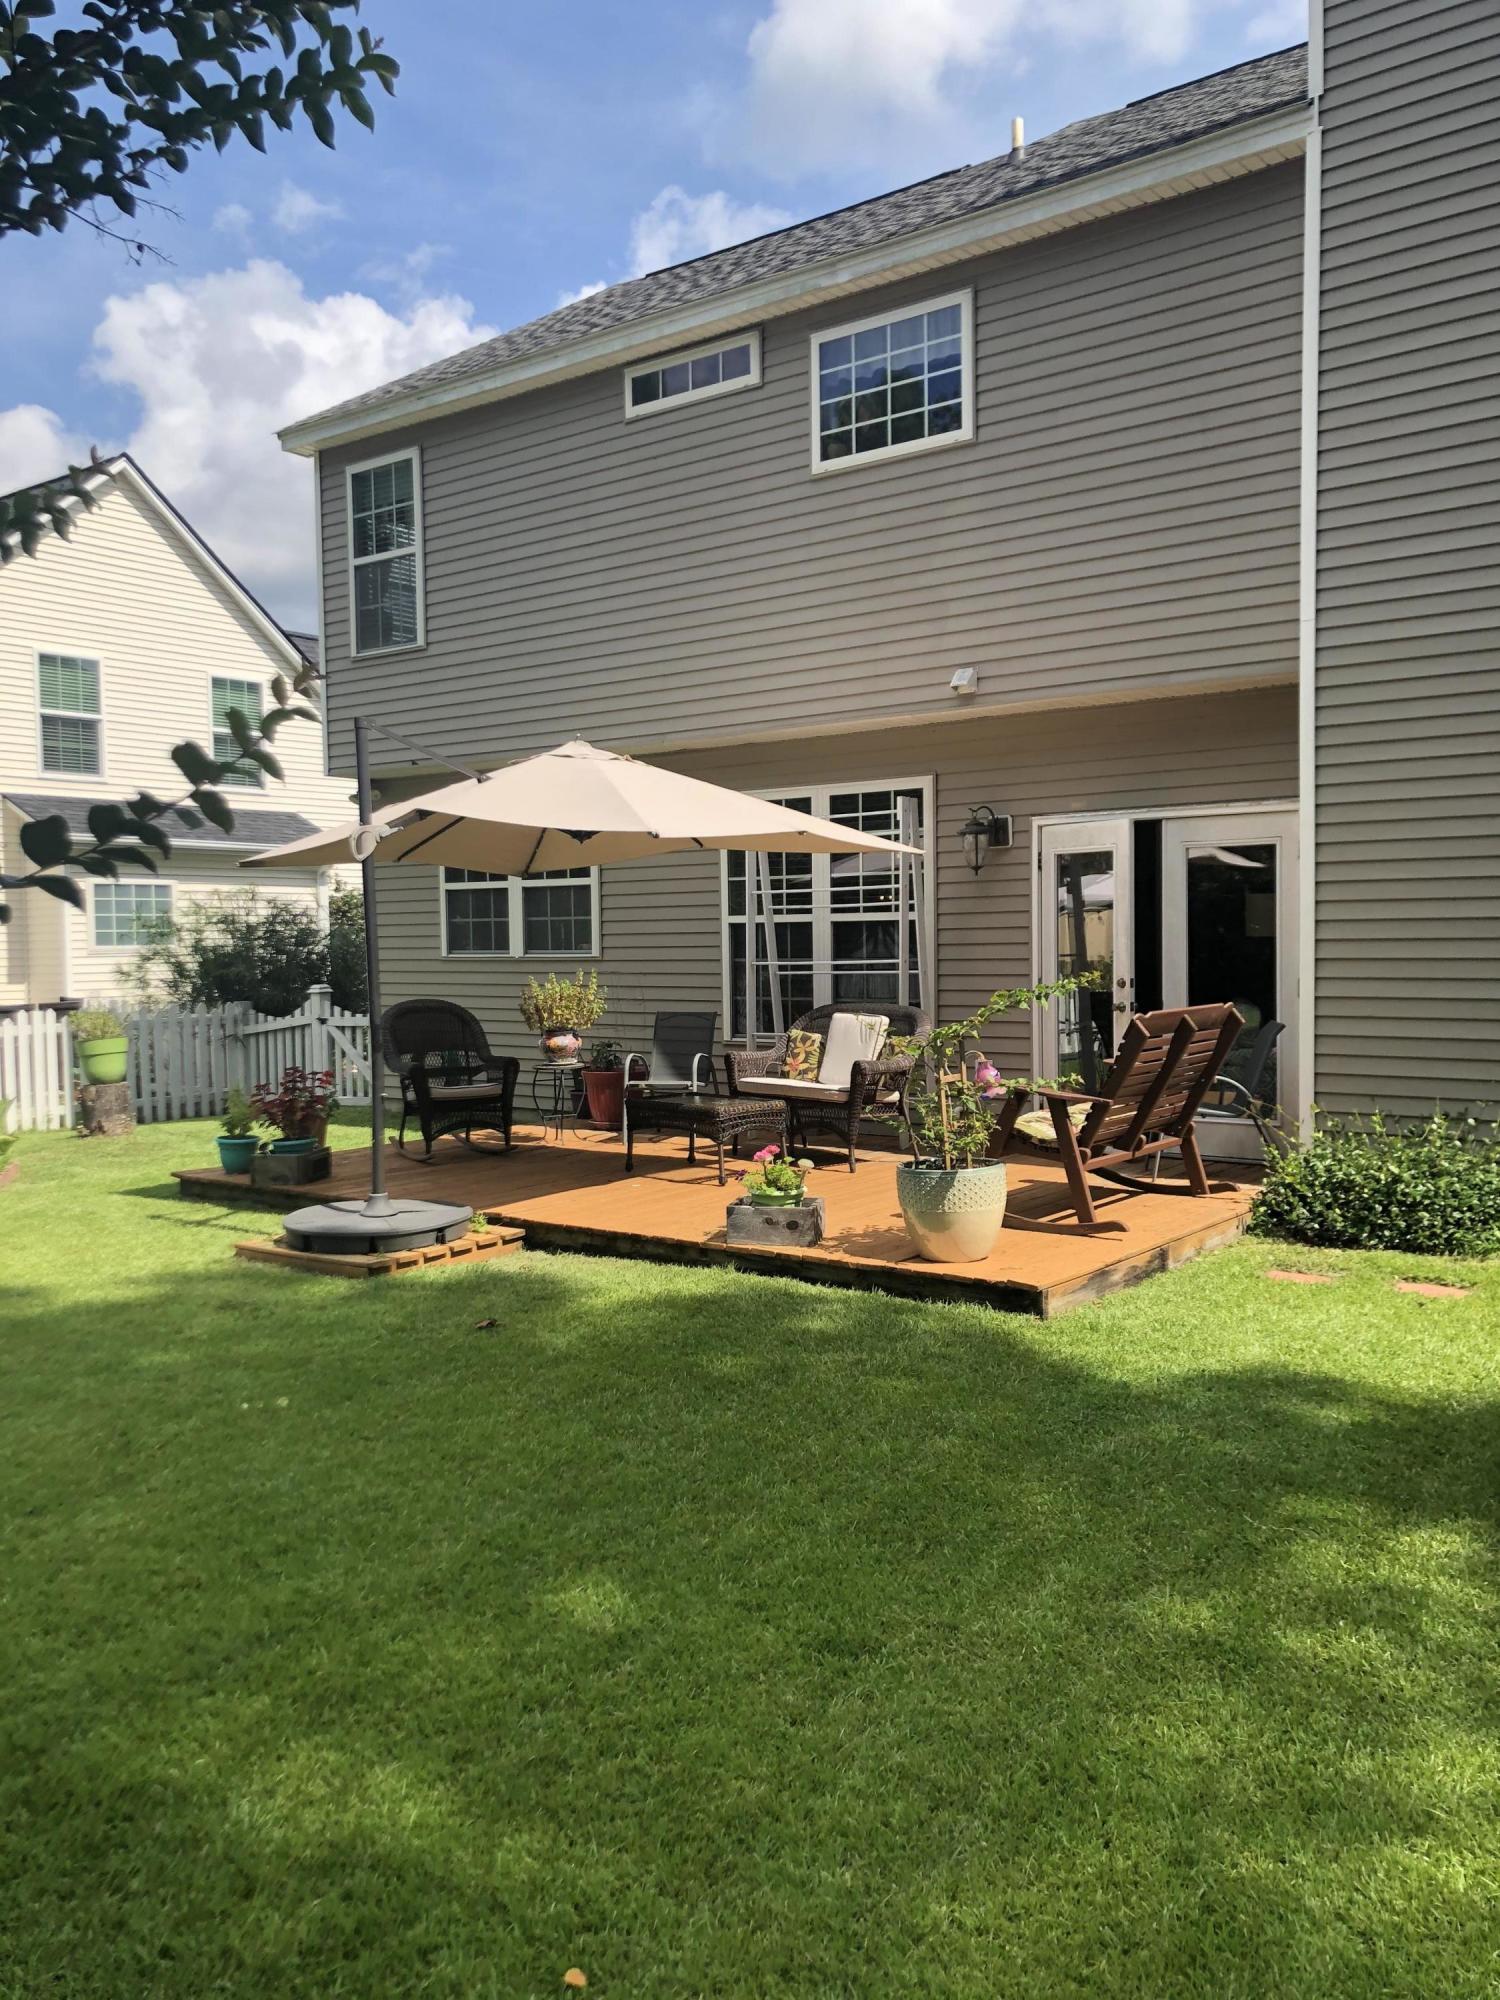 Dunes West Homes For Sale - 1500 Cypress Pointe, Mount Pleasant, SC - 20